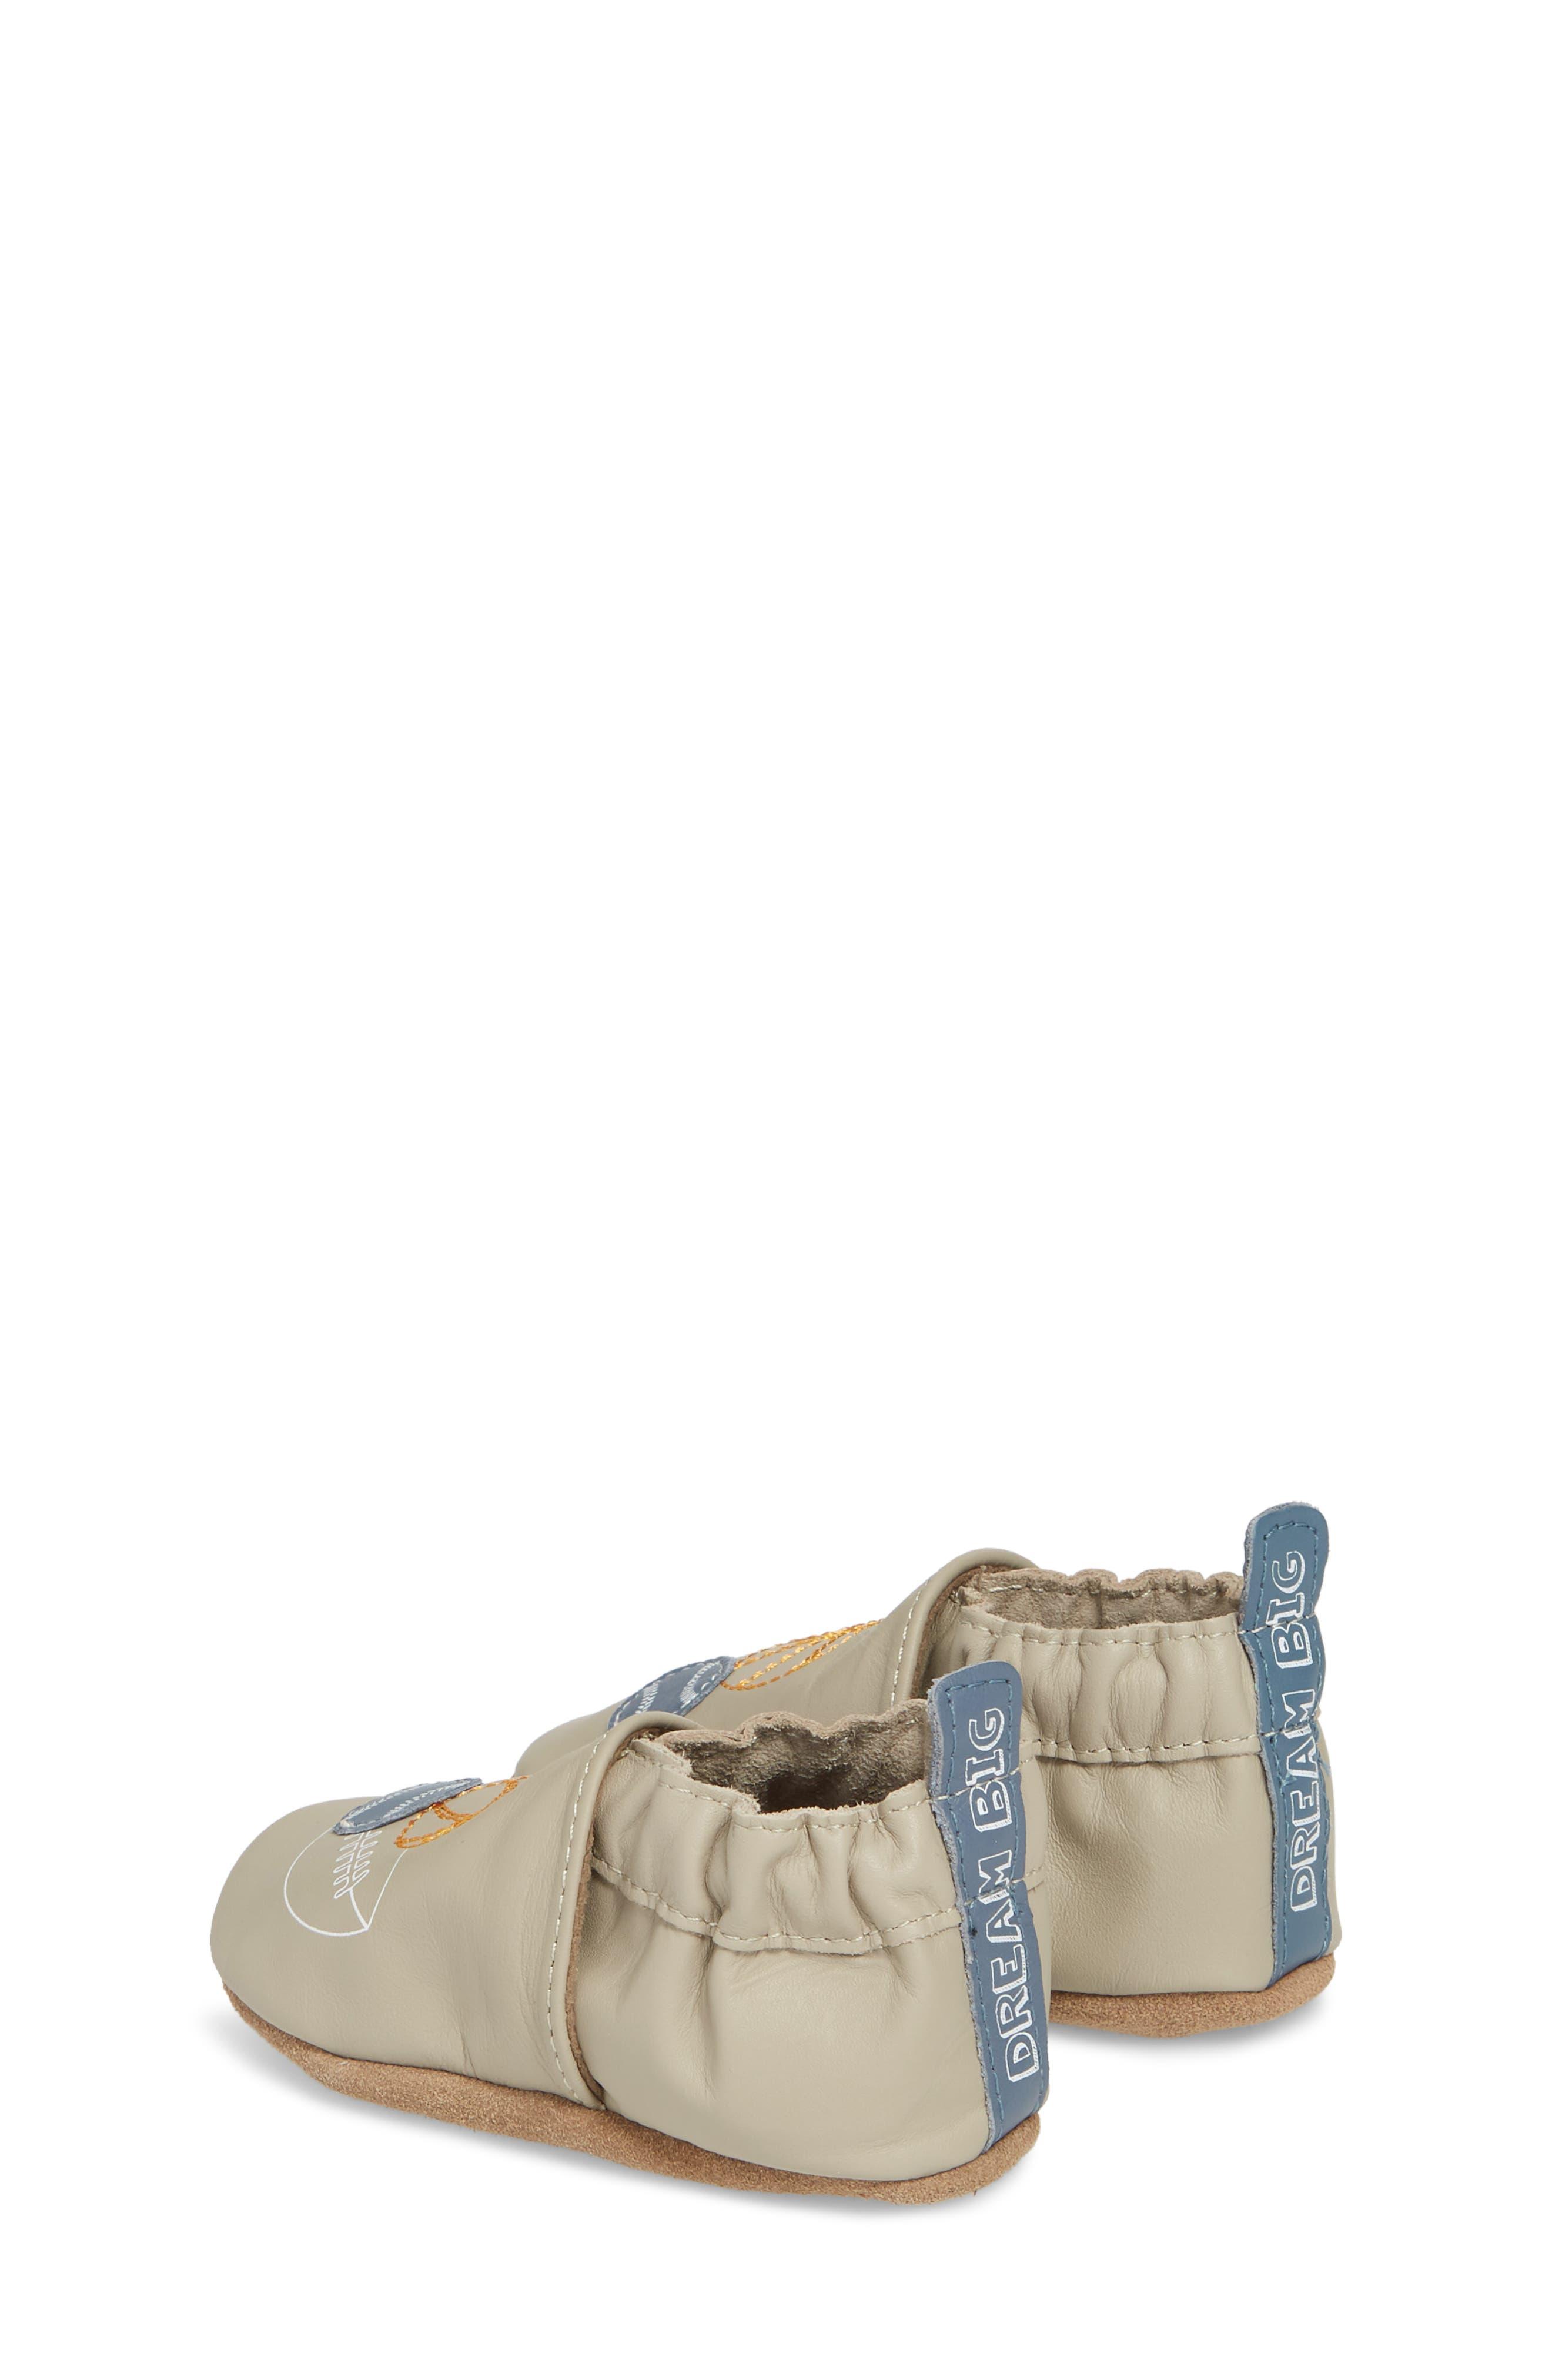 Dream Big Moccasin Crib Shoe,                             Alternate thumbnail 2, color,                             Taupe